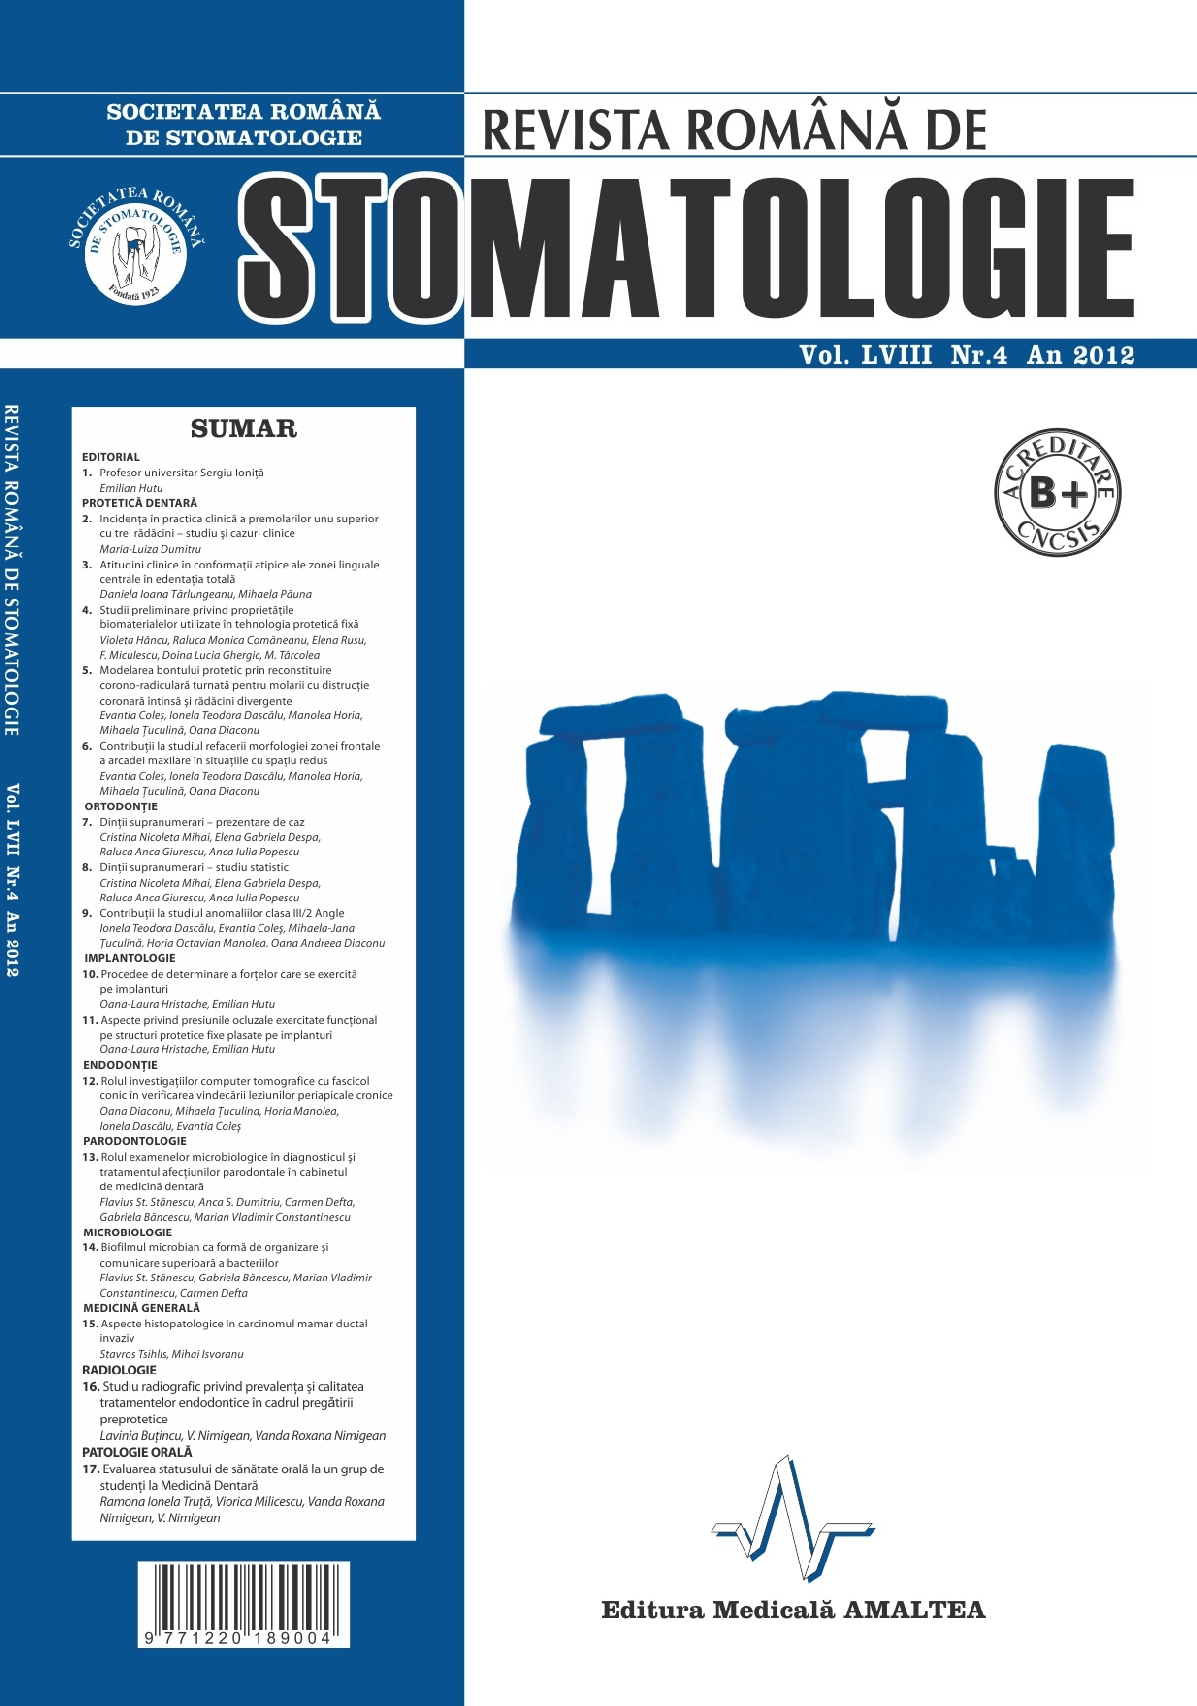 Revista Romana de STOMATOLOGIE - Romanian Journal of Stomatology, Vol. LVIII, Nr. 4, An 2012